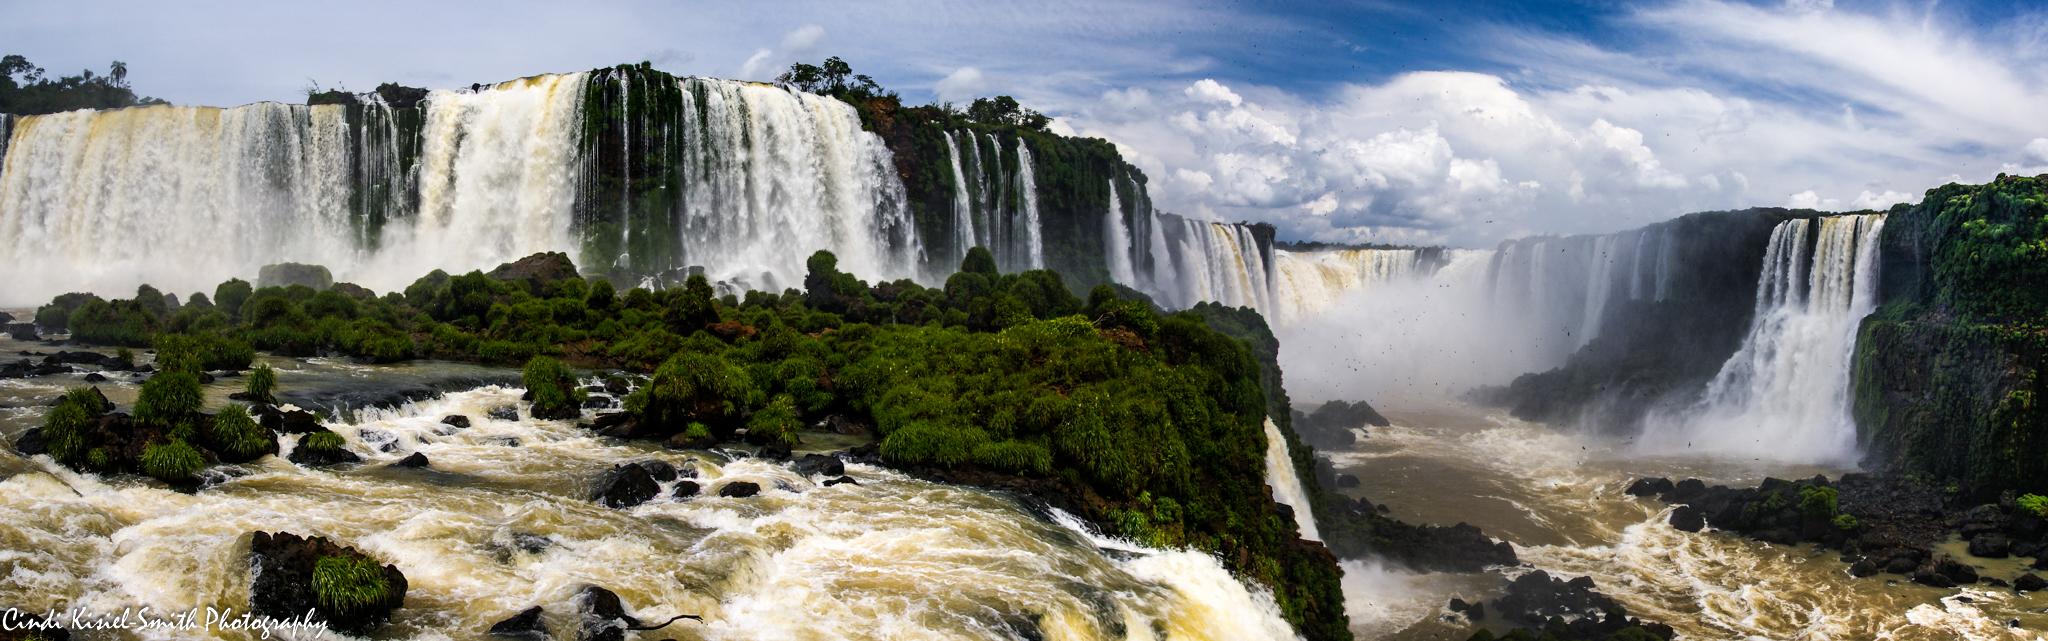 Iguazu Falls Brazil side, Brazil